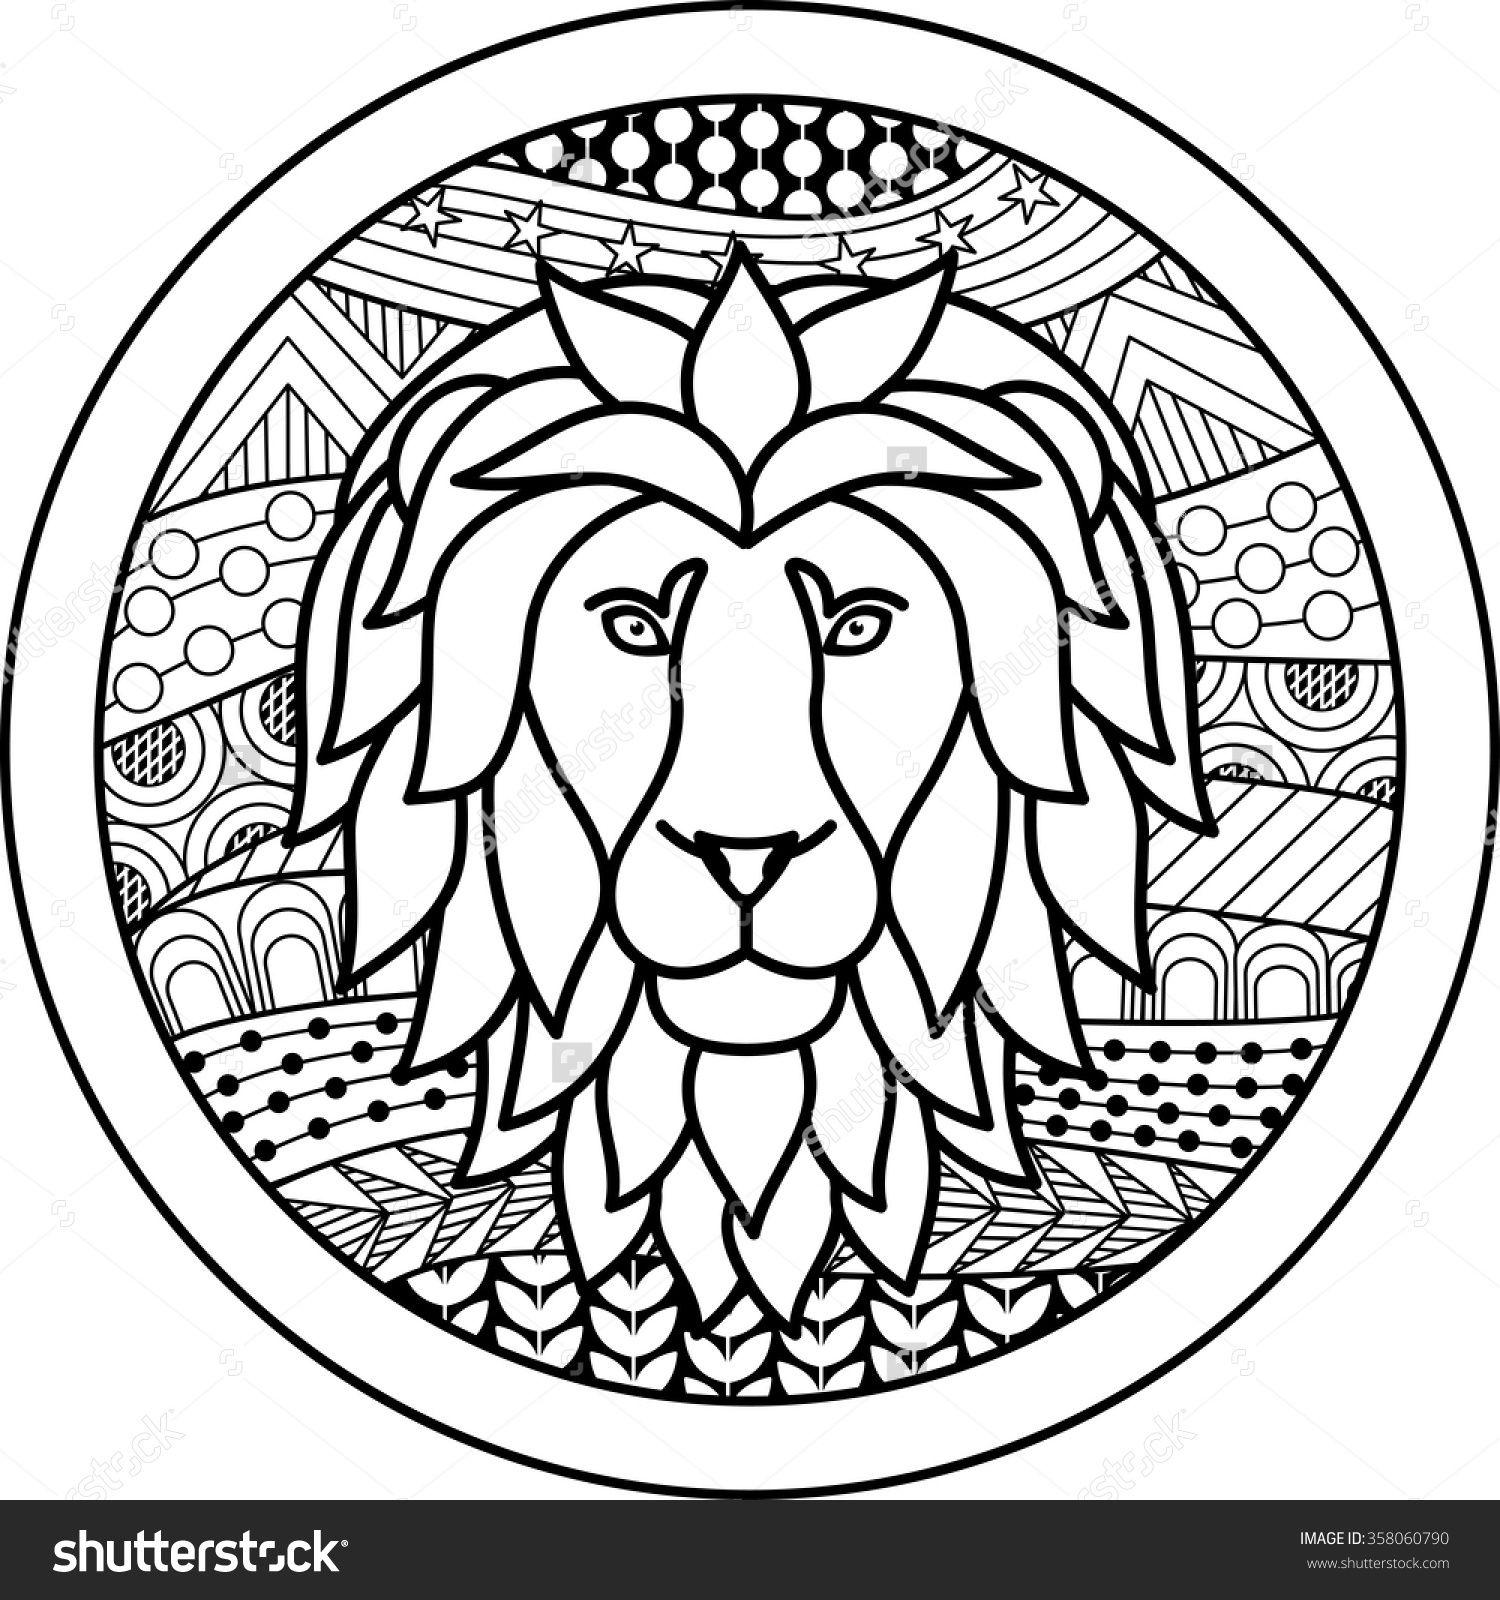 Zodiac sign Leo zentangle | Paint a New... | Pinterest | Horoskop ...